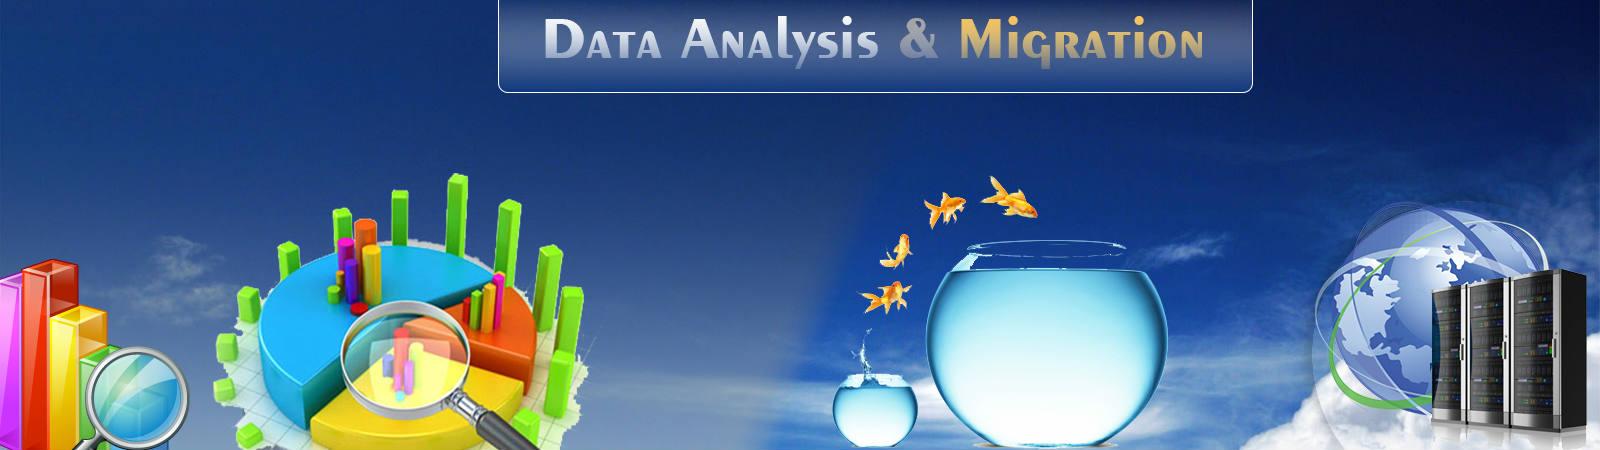 Data Analysis & Migration